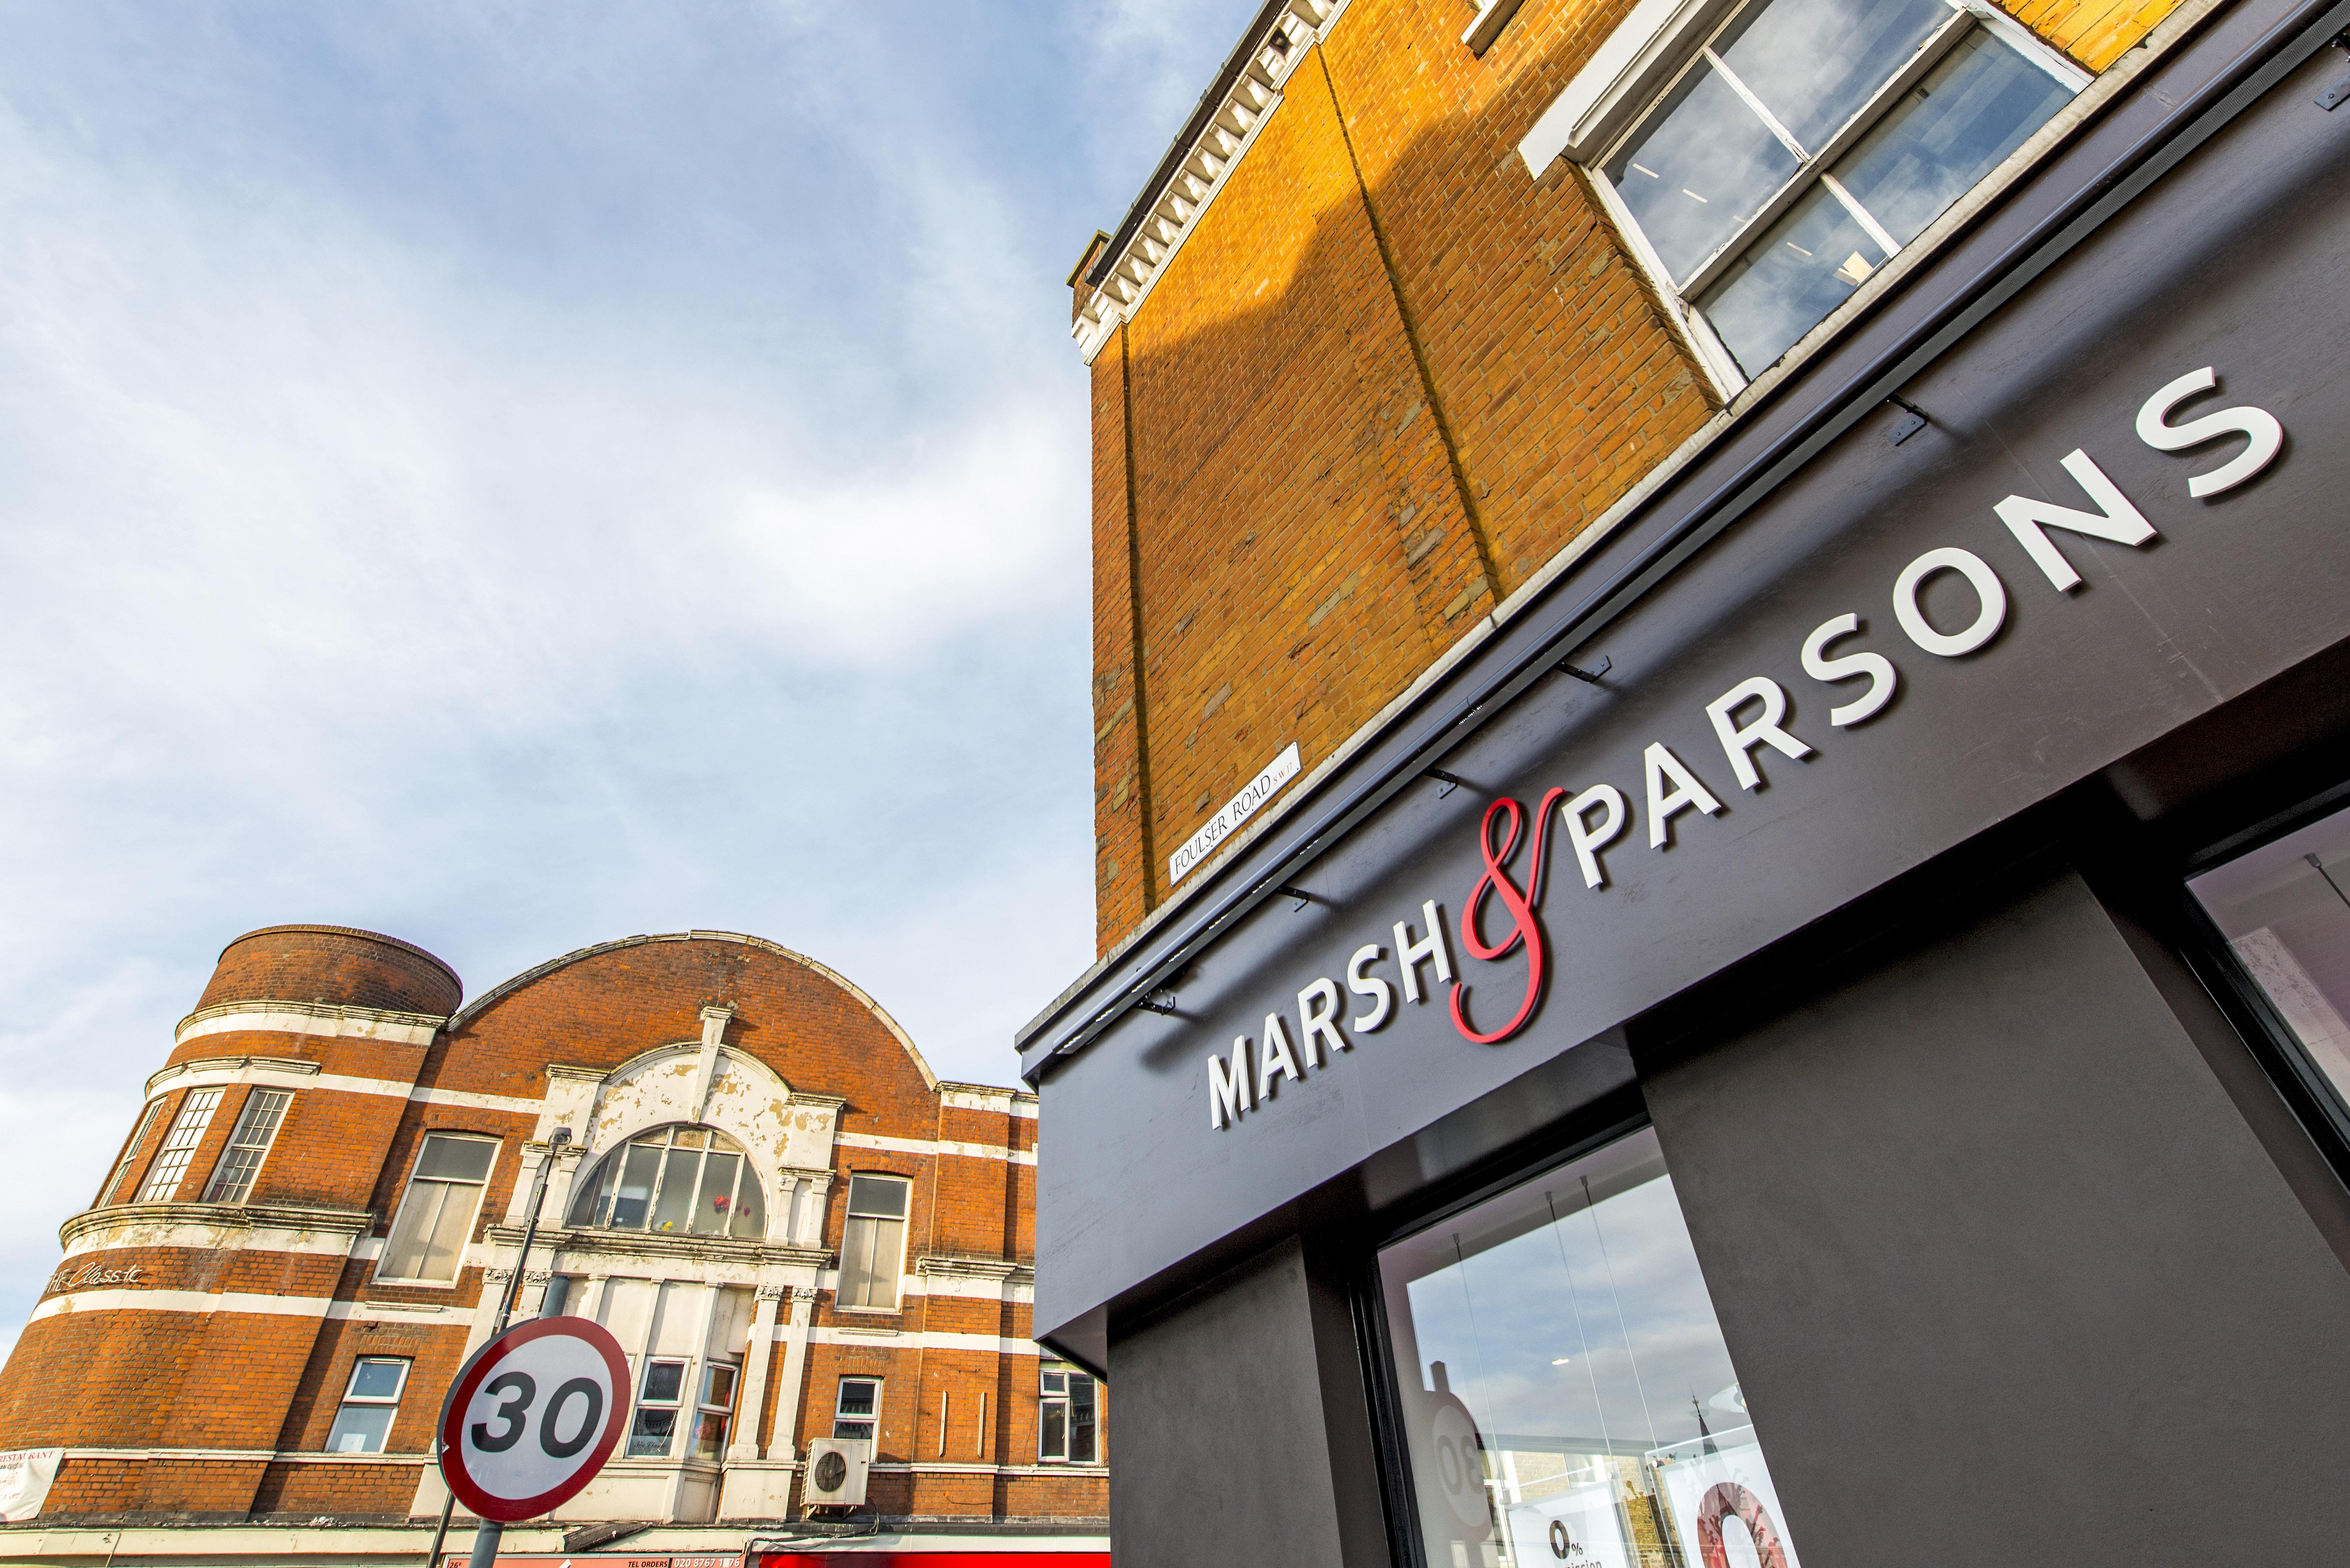 Marsh & Parsons Office